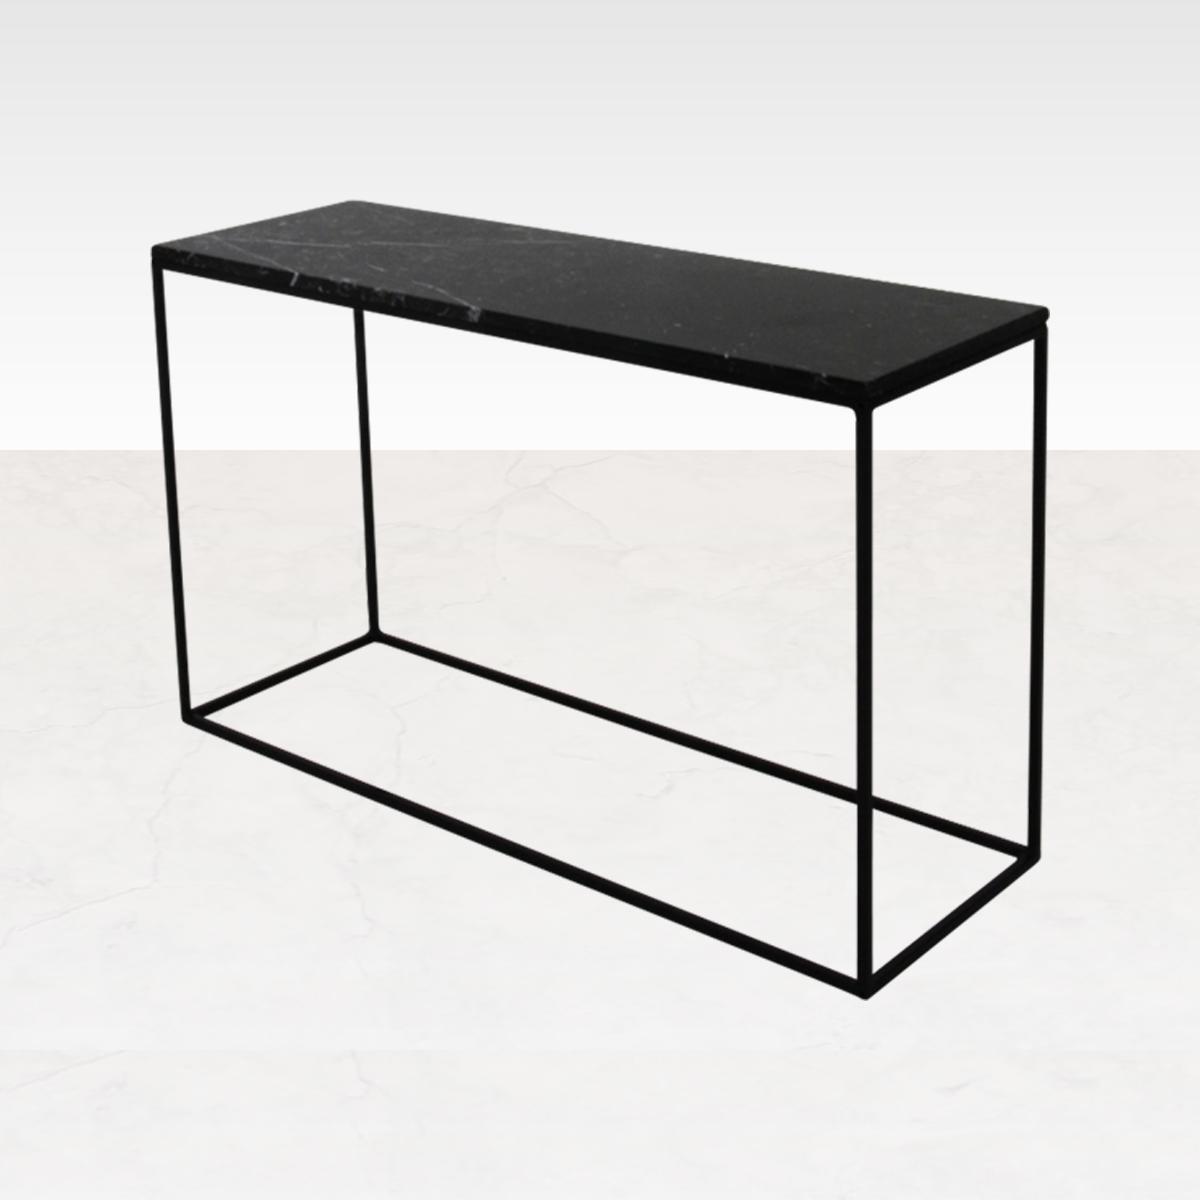 Marmeren Sidetable Zwart 140 x 40